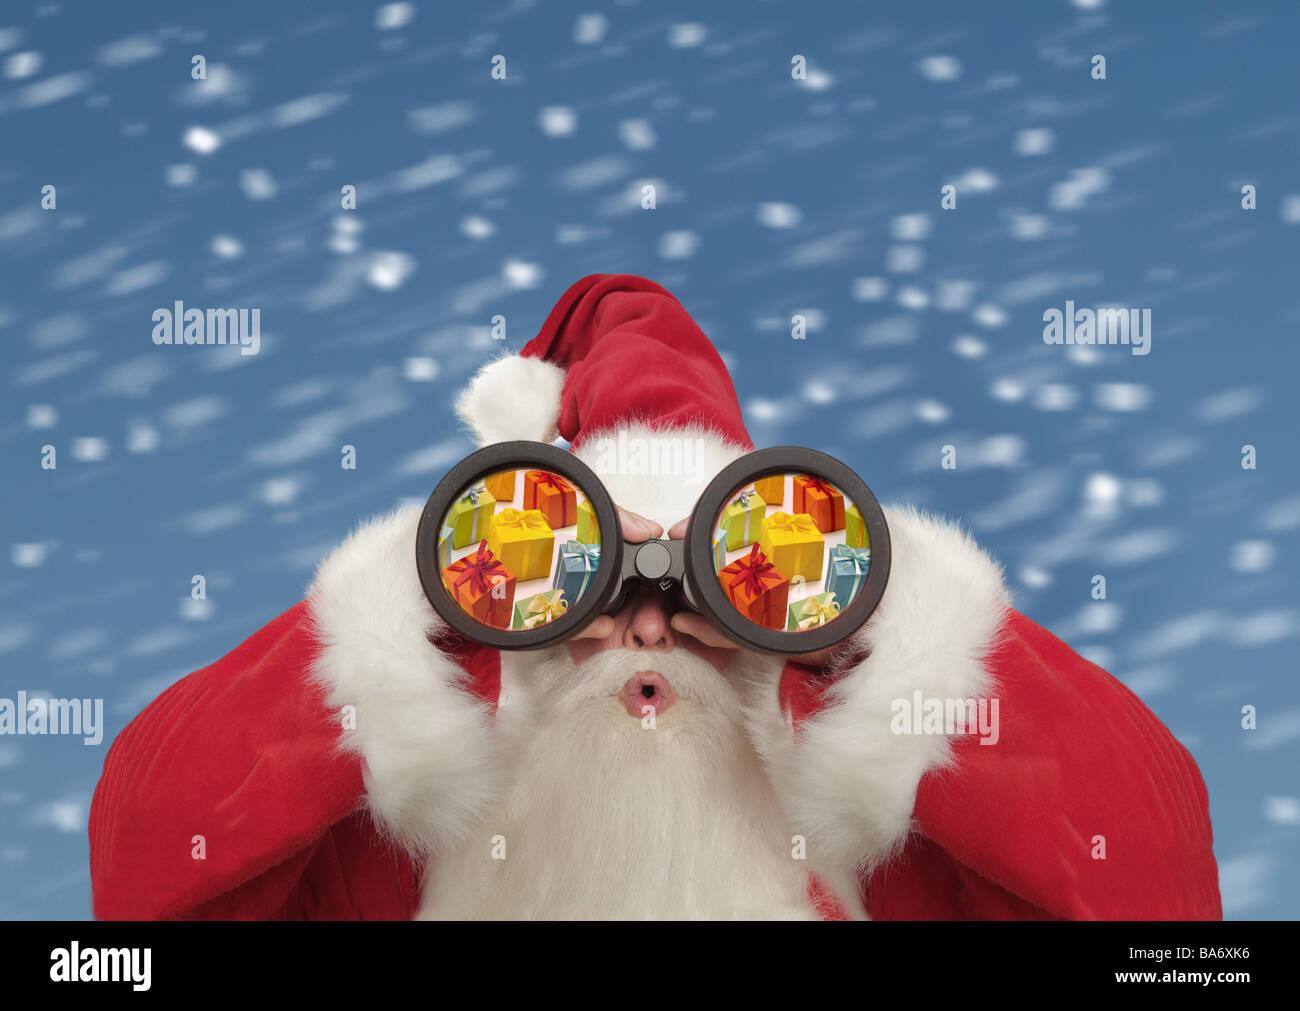 Christmas Nikolaus Binoculars Surprises Gift Snowfall Composing Gaze